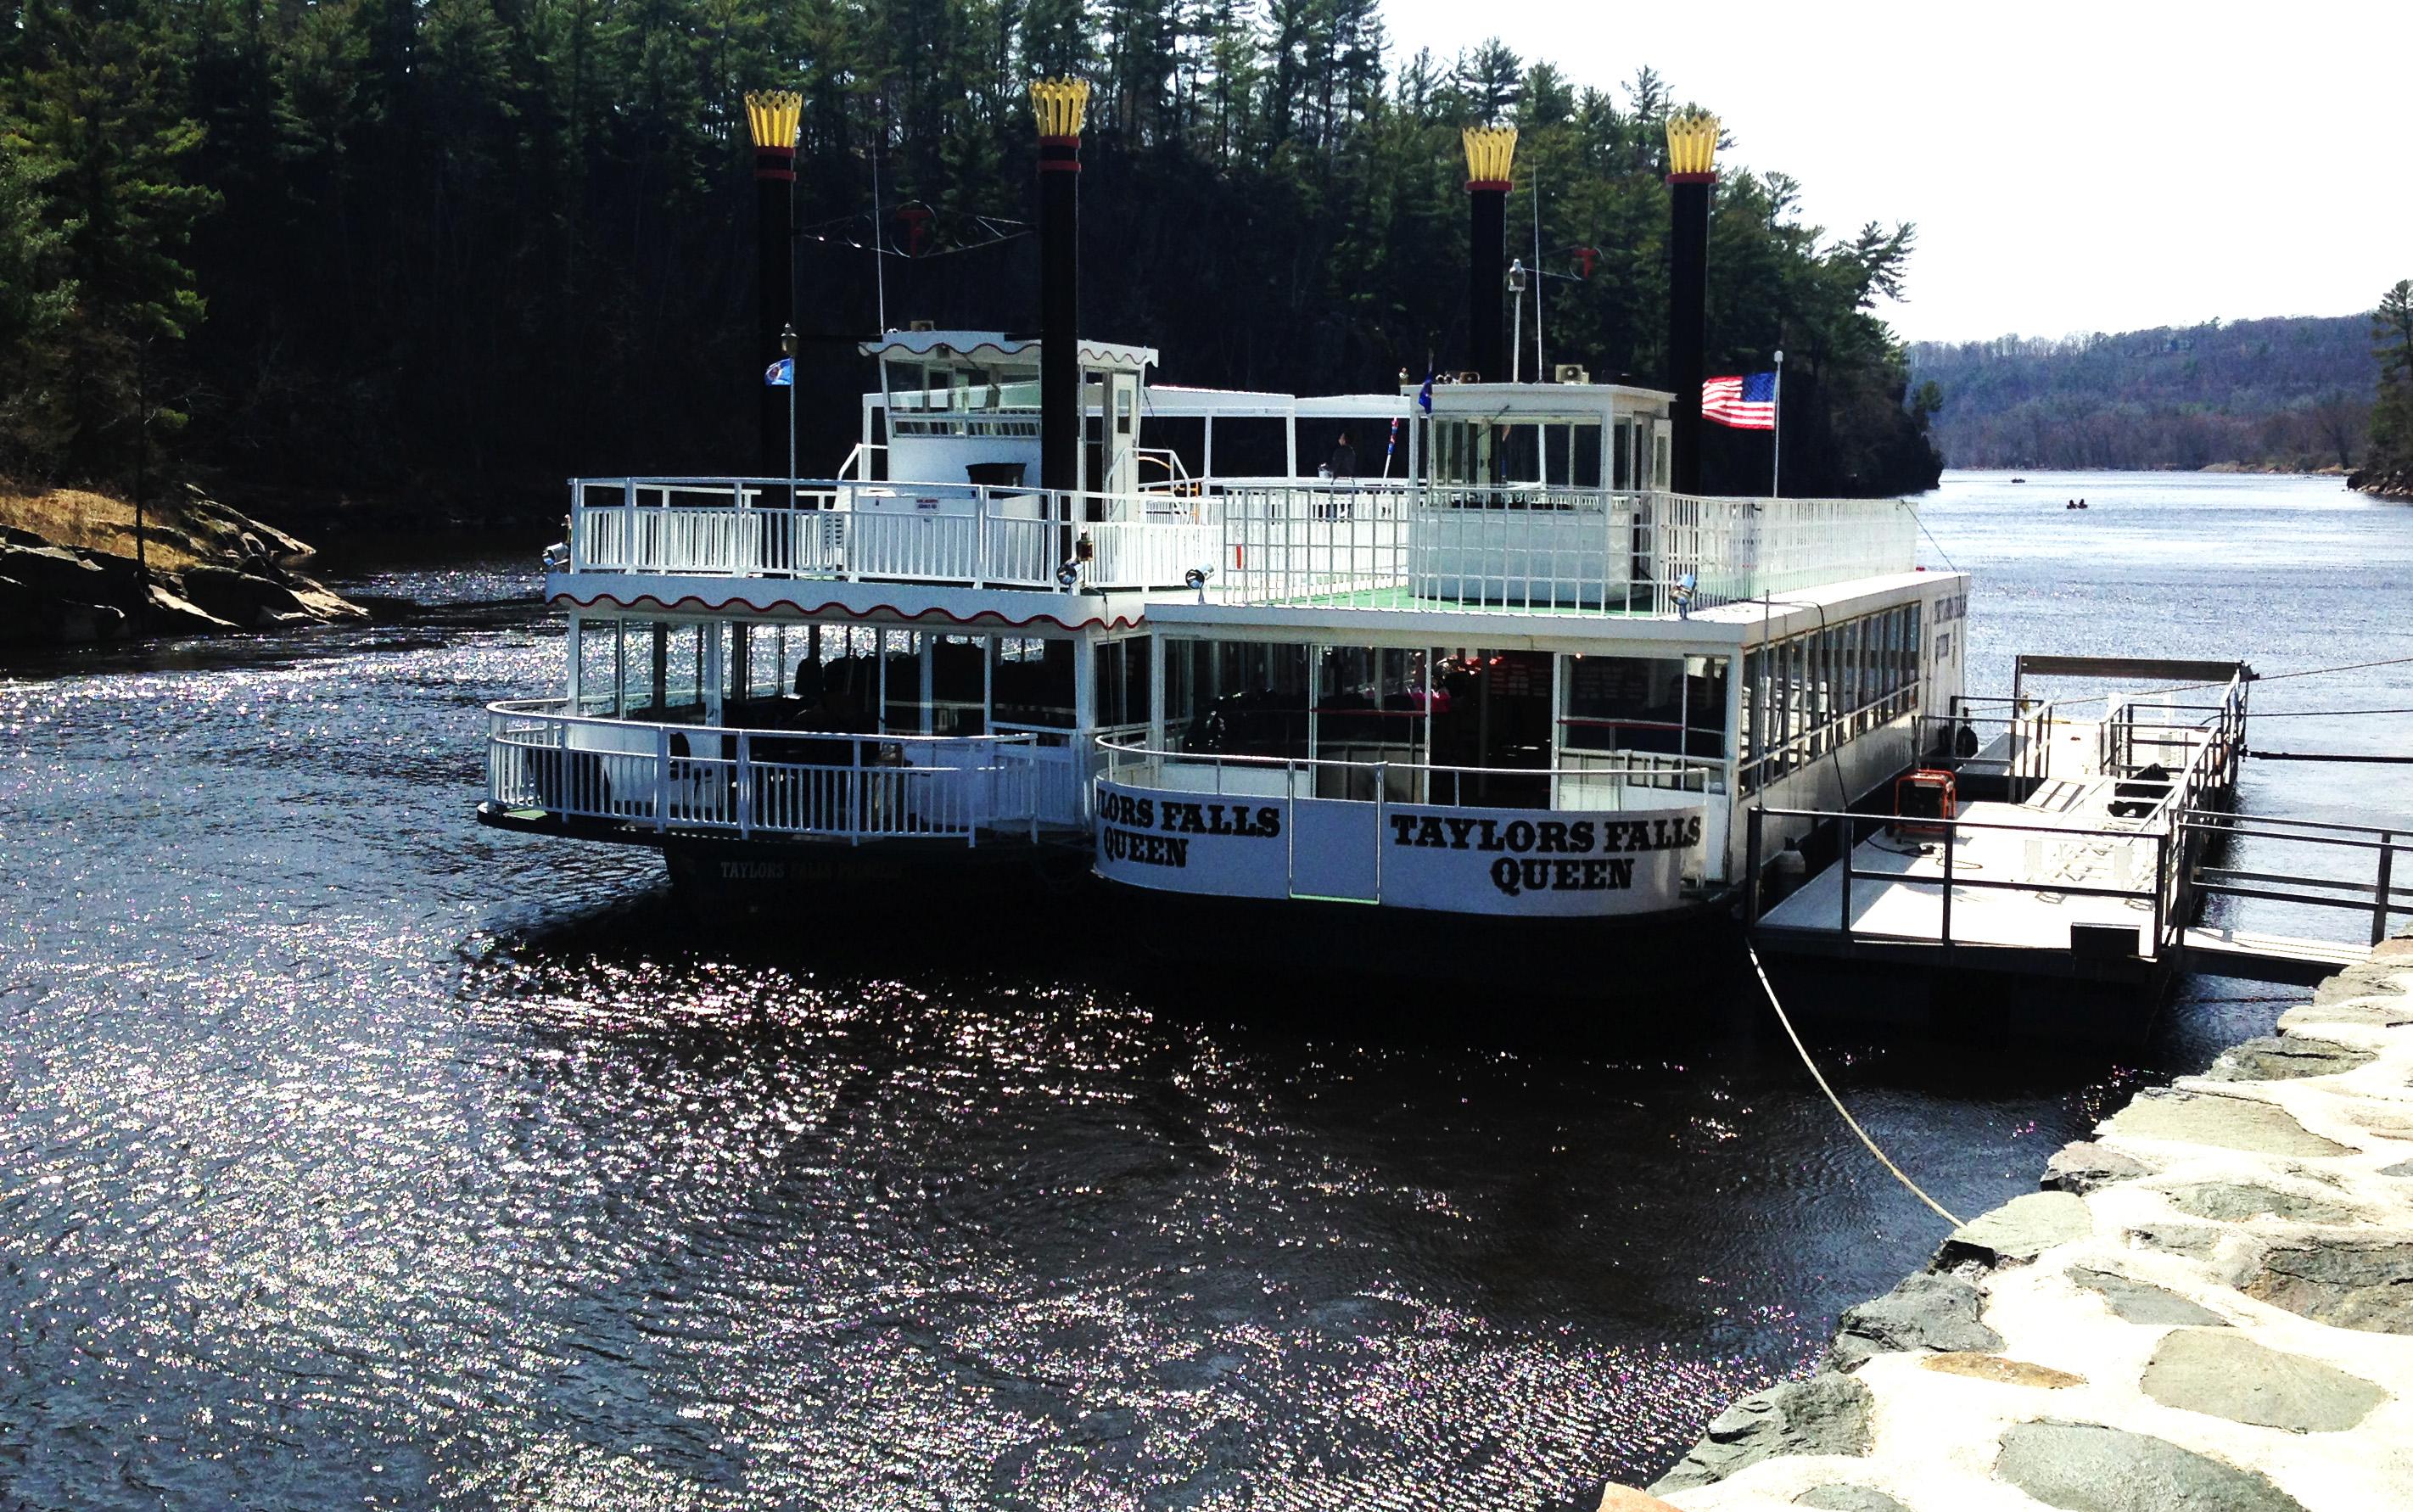 LSDISpringPaddleboats